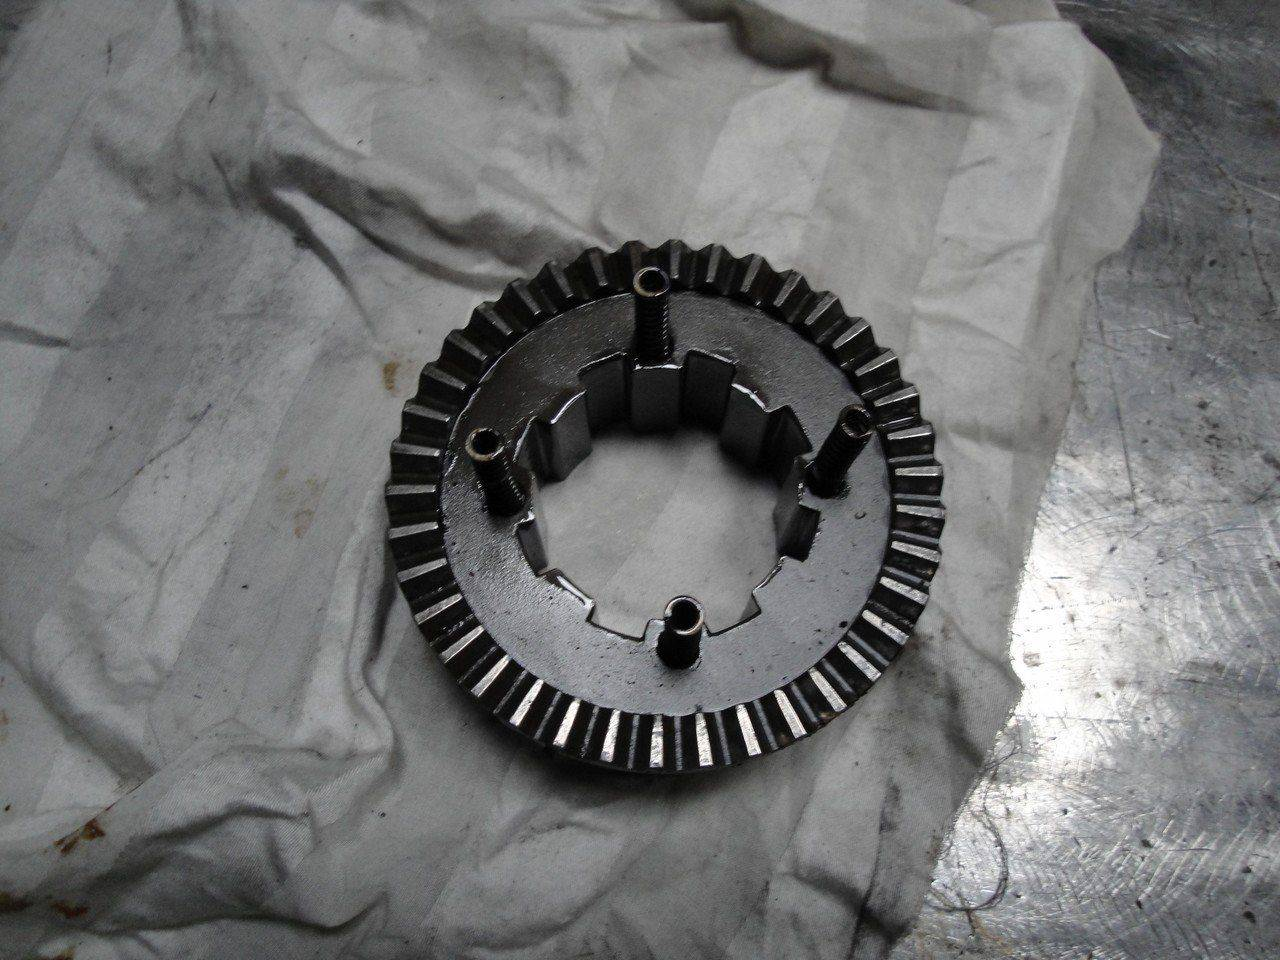 DSC00431.JPG